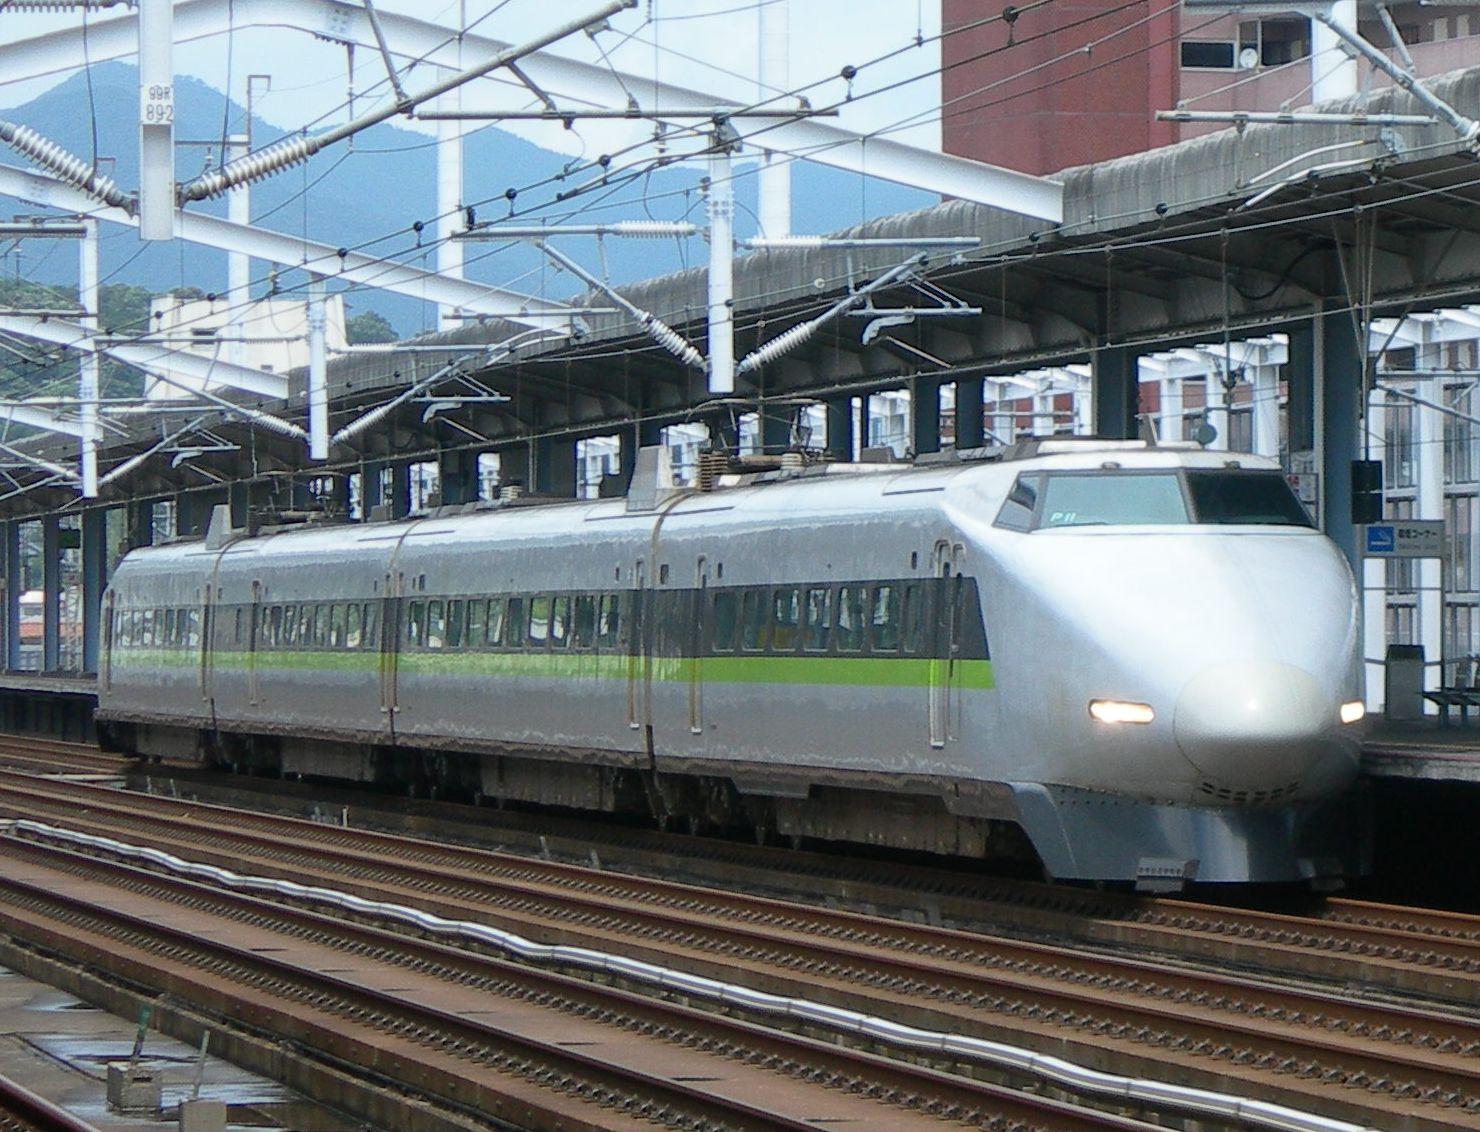 https://upload.wikimedia.org/wikipedia/commons/f/f4/JRWest_Shinkansen_Series_100_P11.jpg